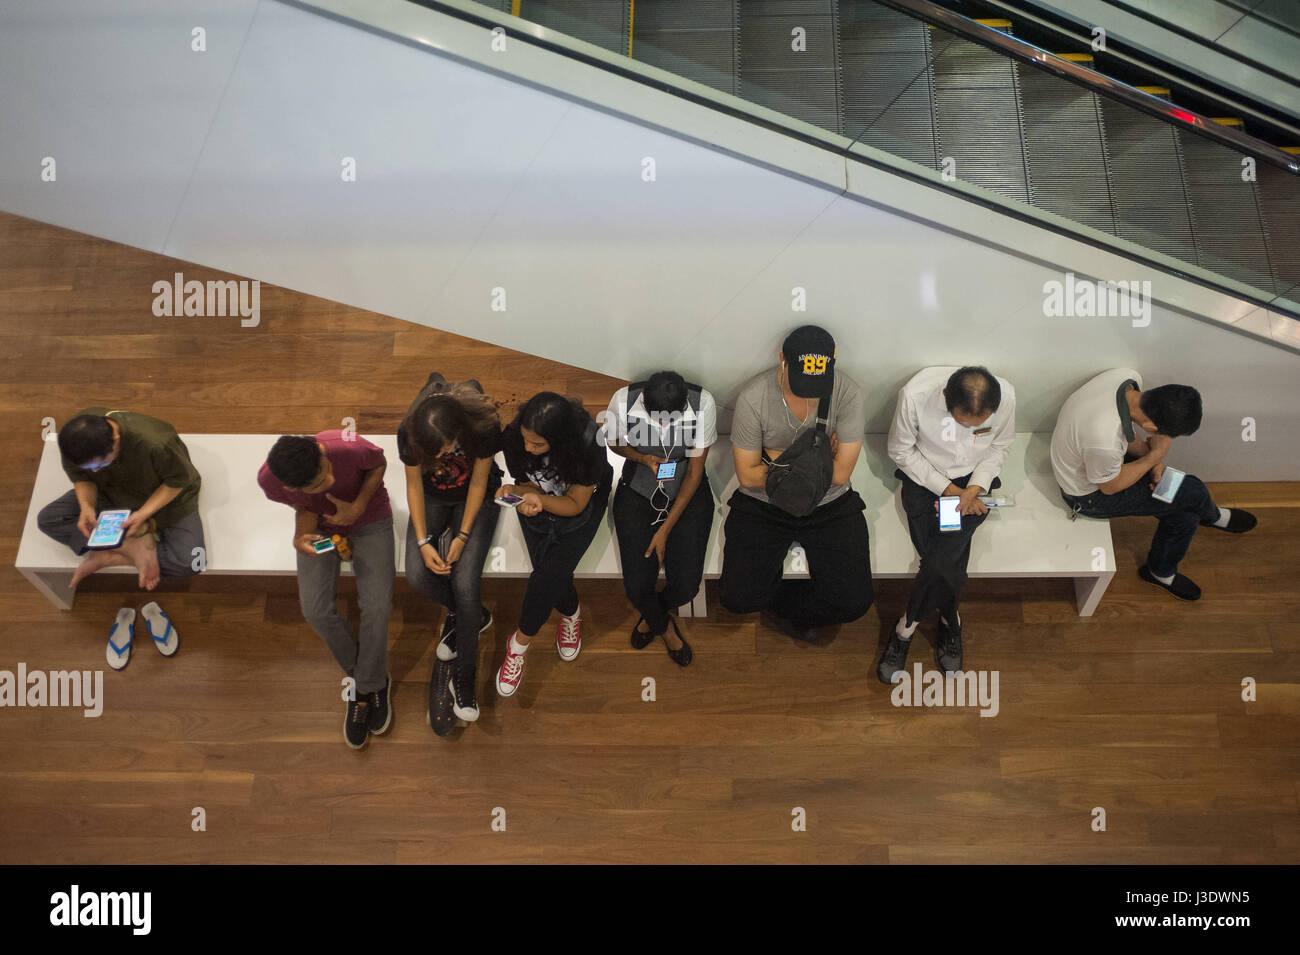 Singapur, Republik Singapur, 2016, Menschen bei der ION Orchard Shopping-Mall Stockbild